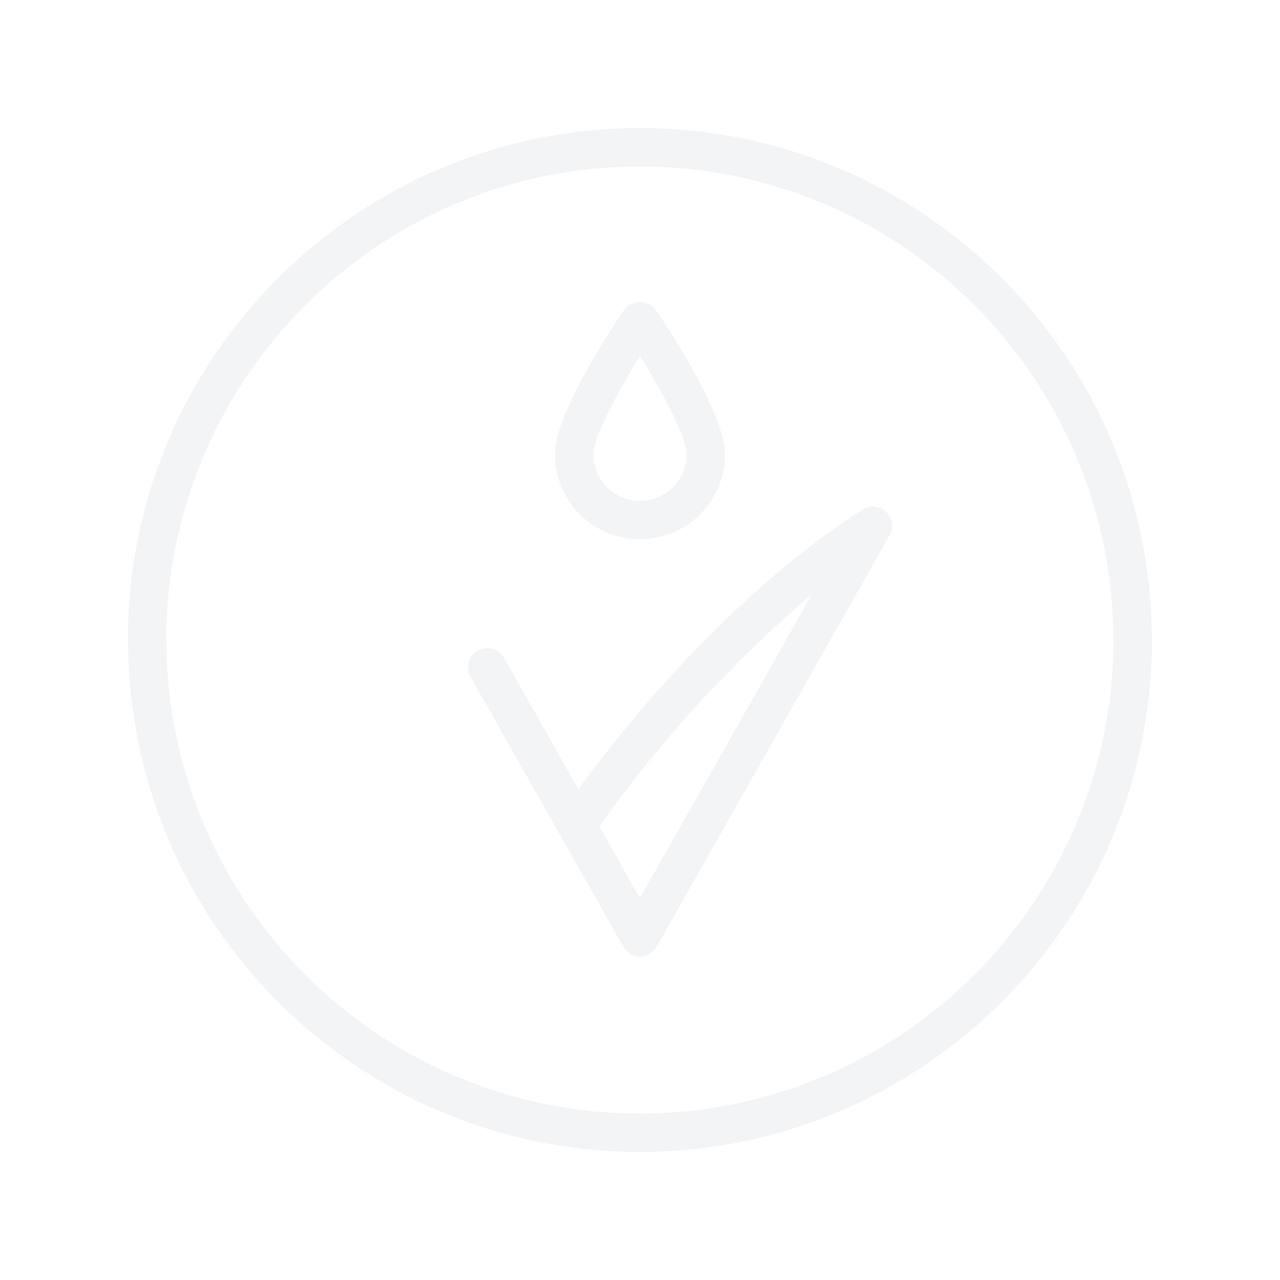 L'OREAL PROFESSIONNEL Powermix Shot Nutri Glycerol 10g